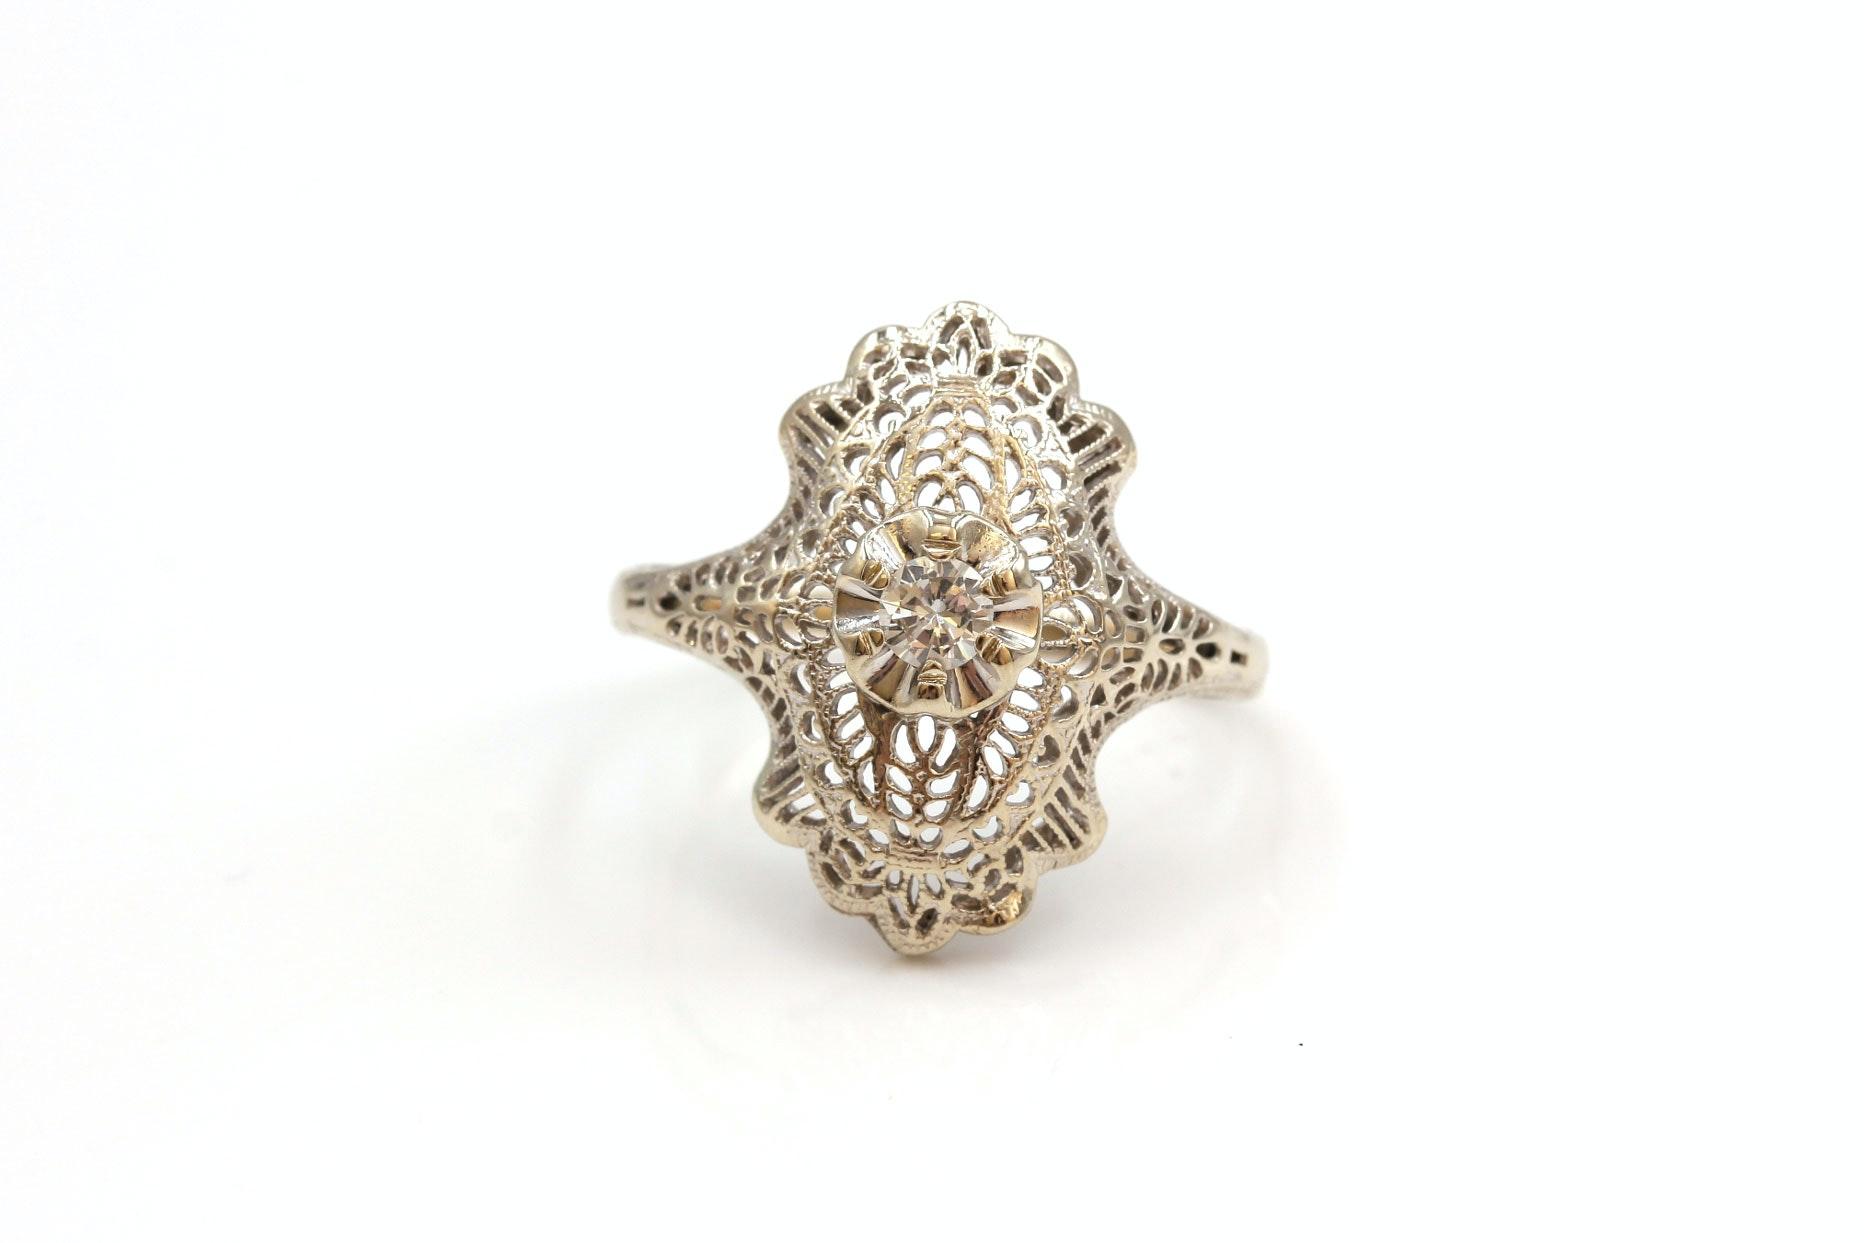 Vintage 14K White Gold Diamond Solitaire Ring